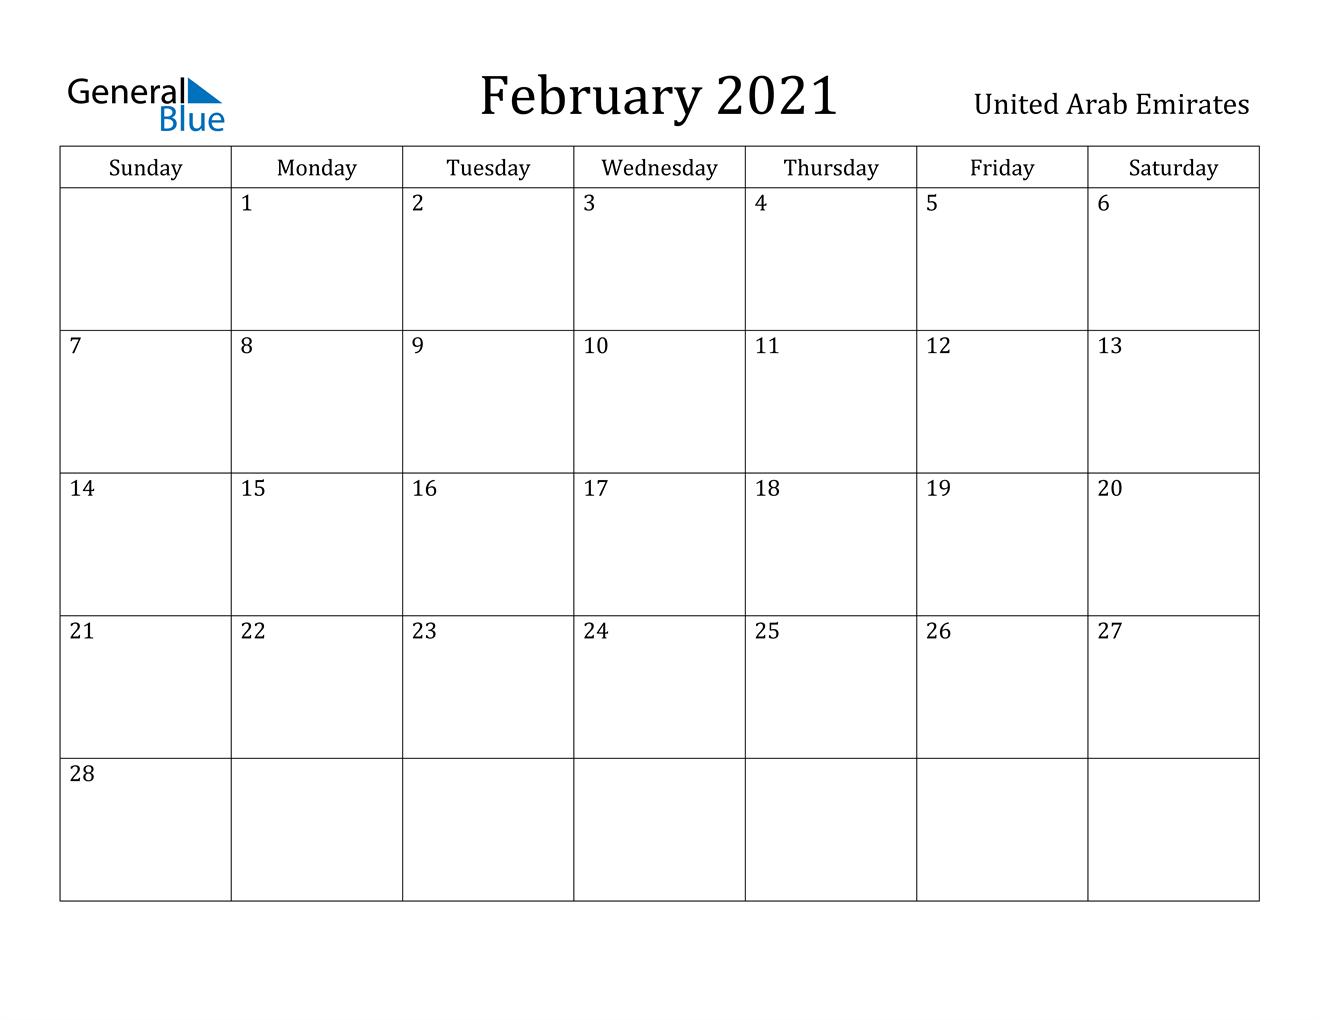 February 2021 Calendar United Arab Emirates